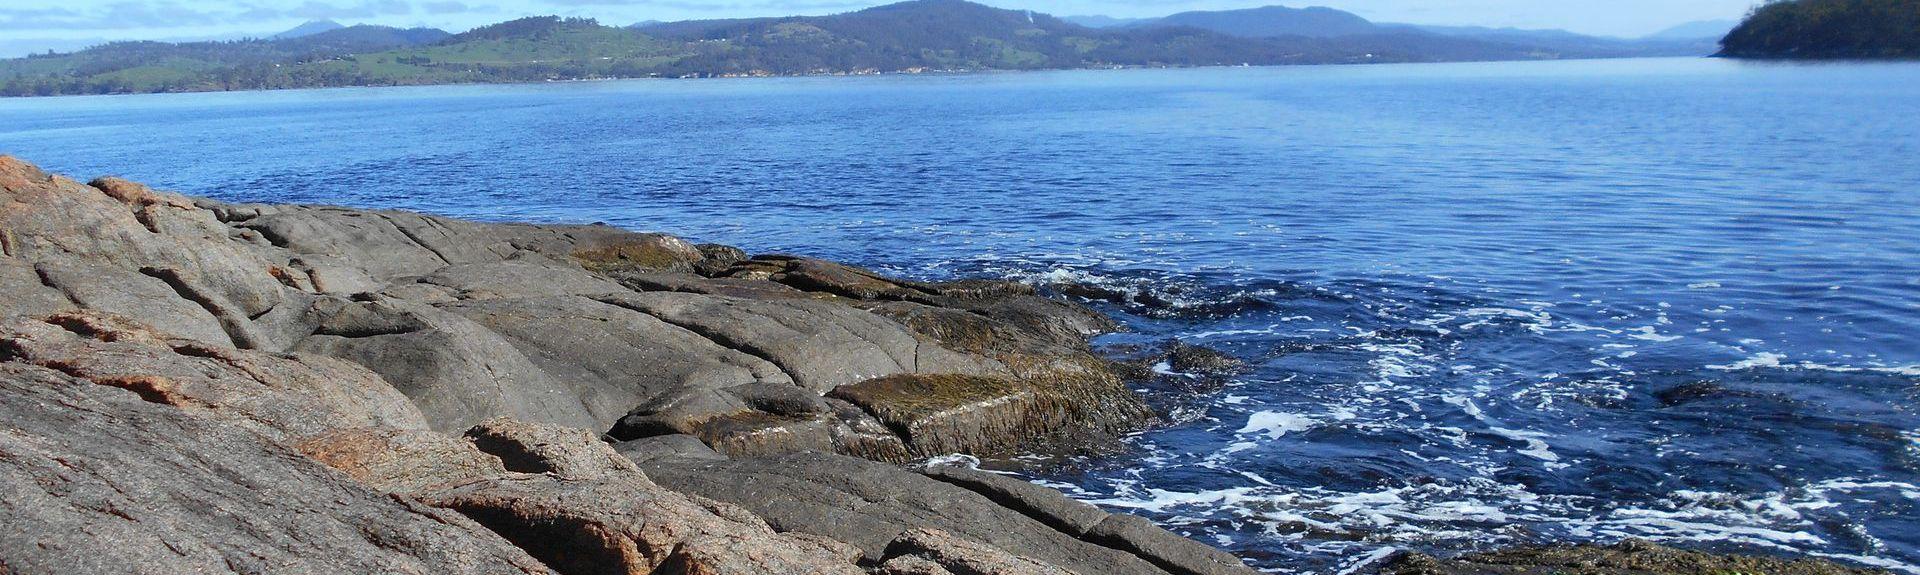 South Bruny, Tasmania, Australia